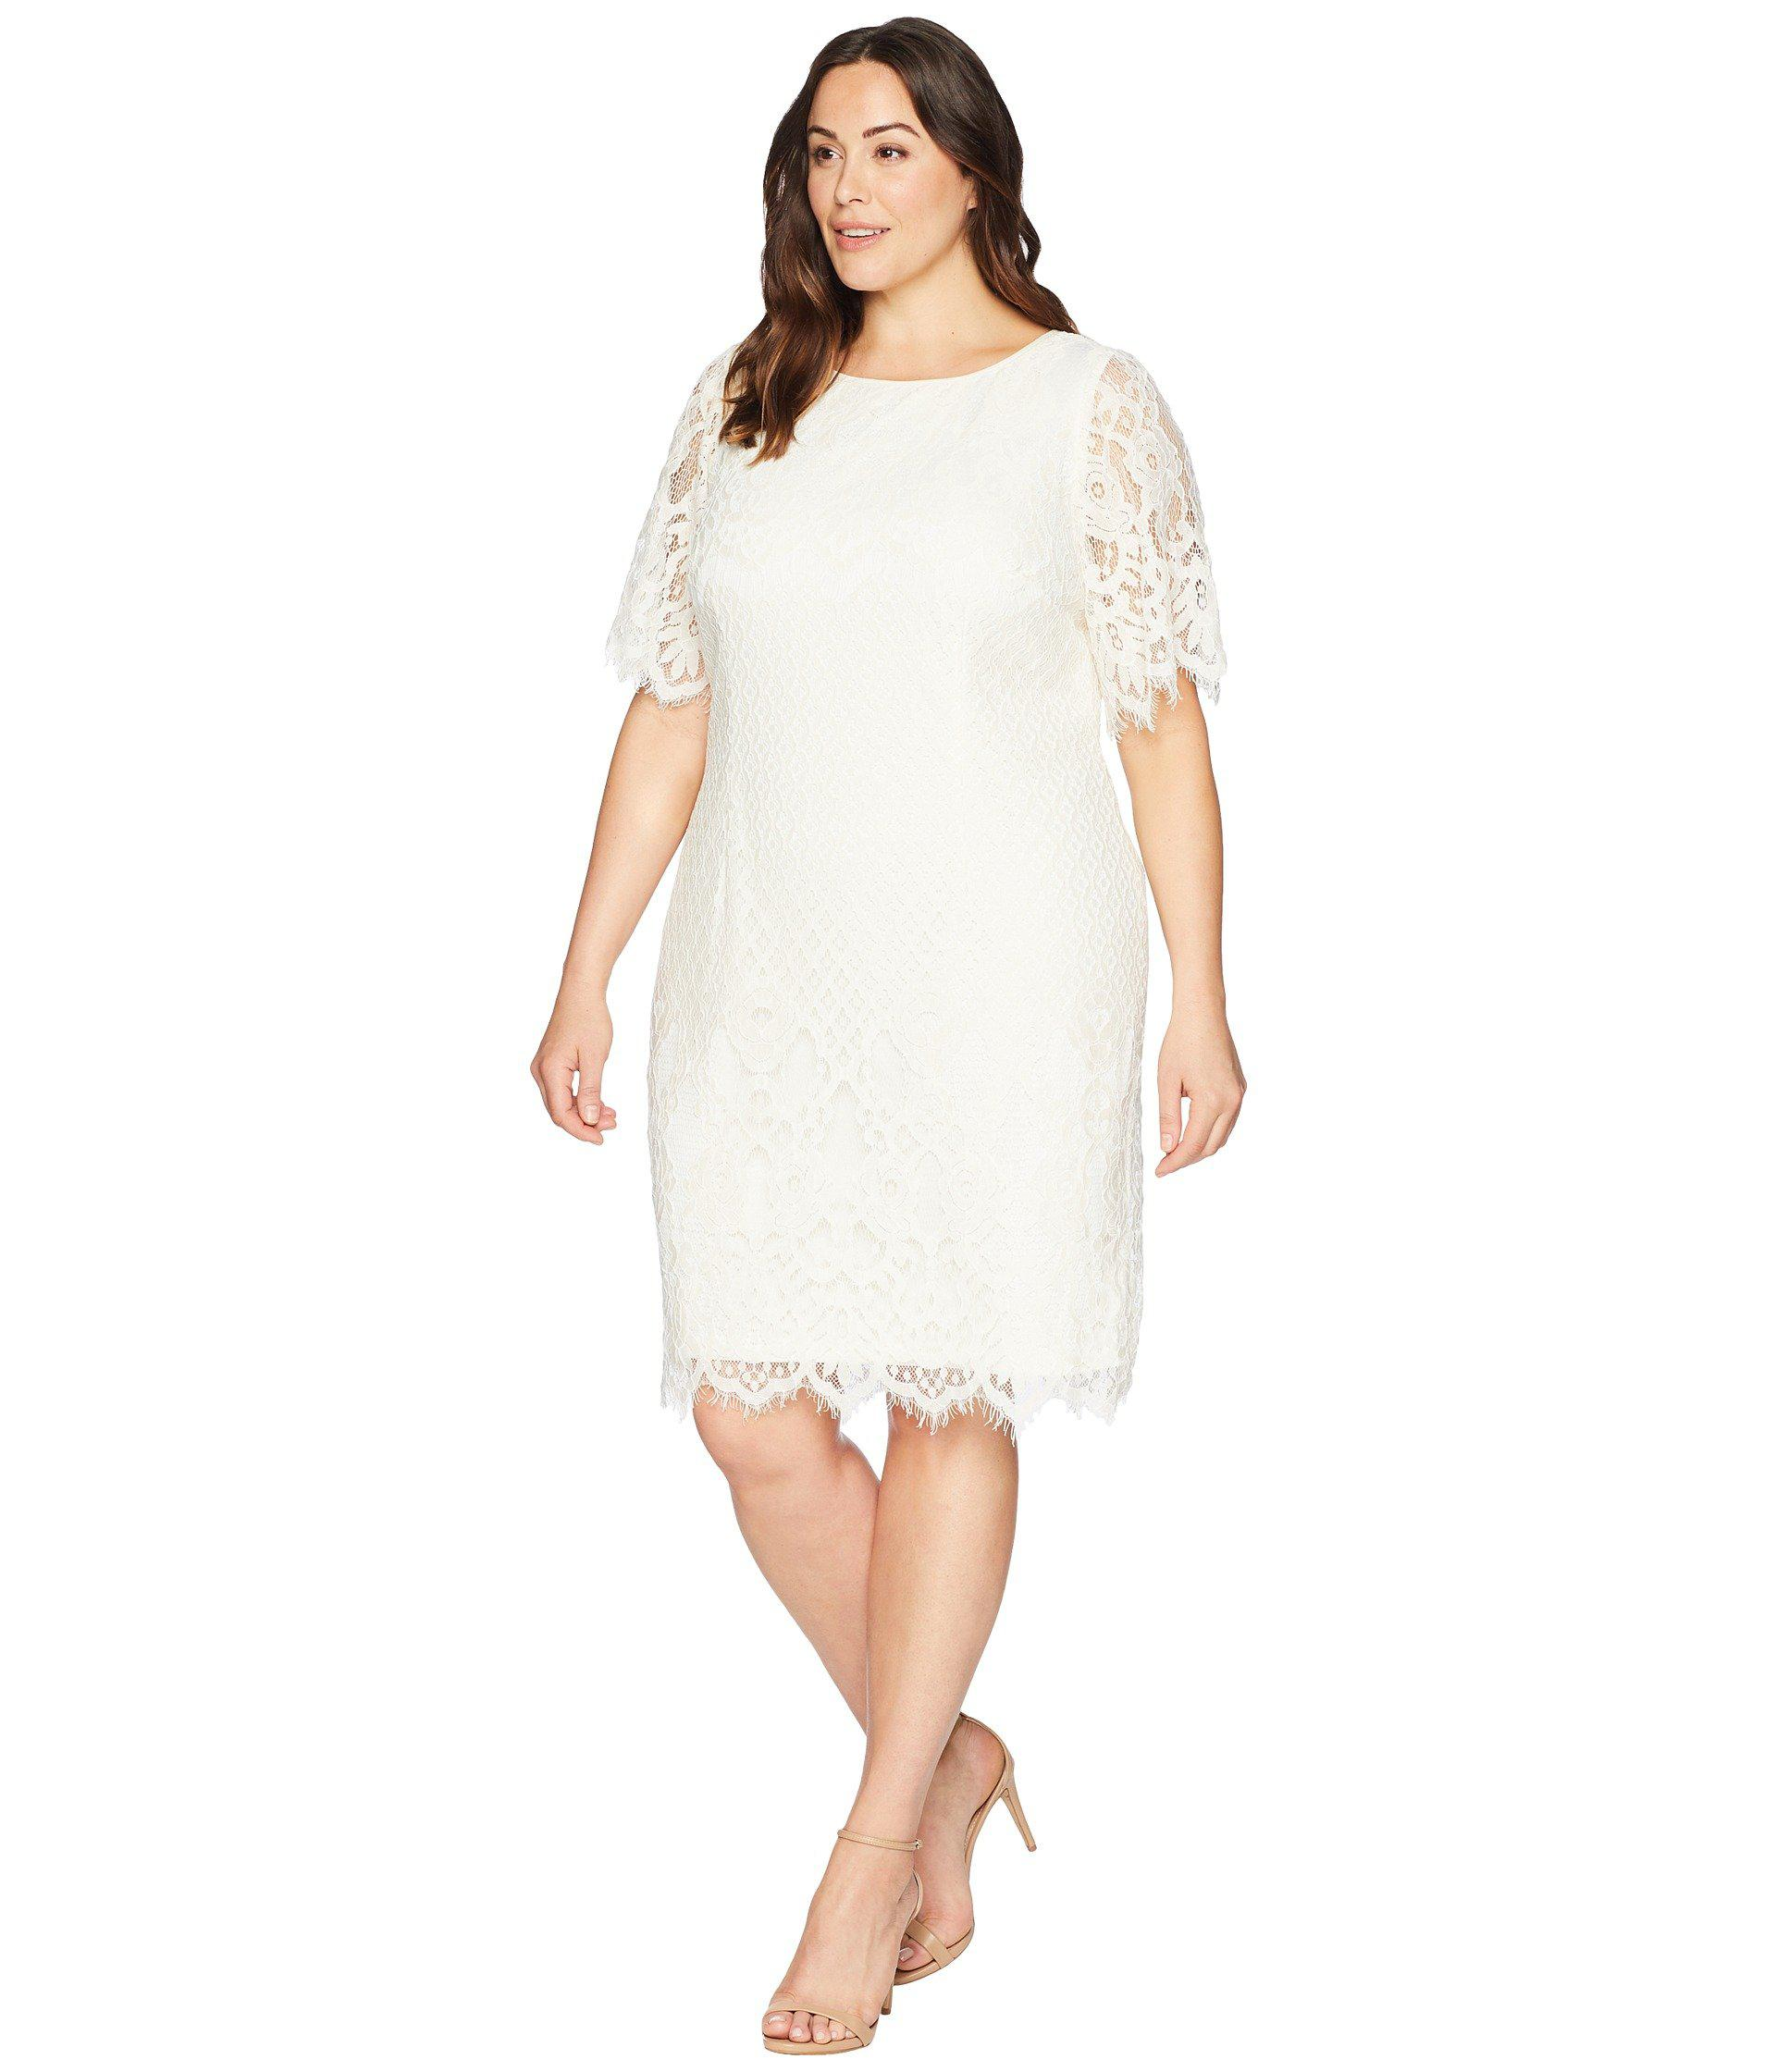 Adrianna Papell Plus Size Eyelet Dress